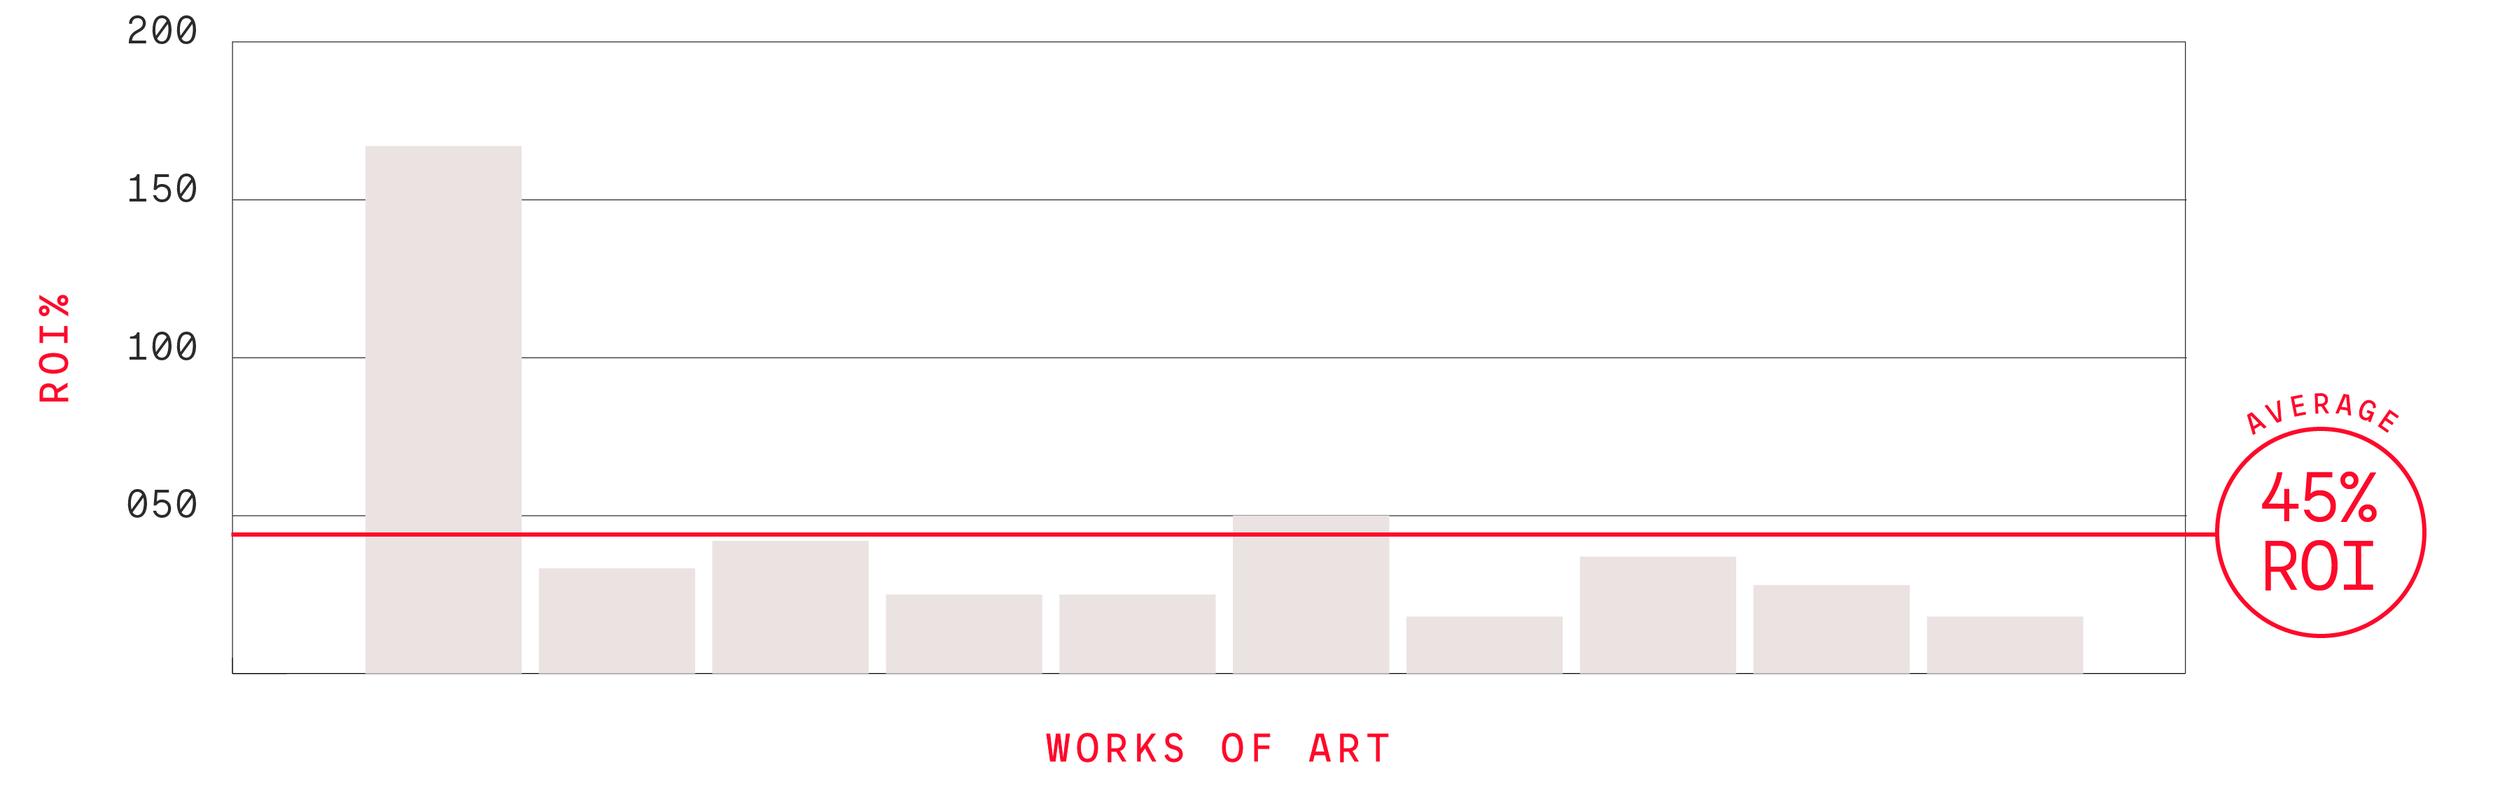 Komo-ROI-Chart_v3_1x.png